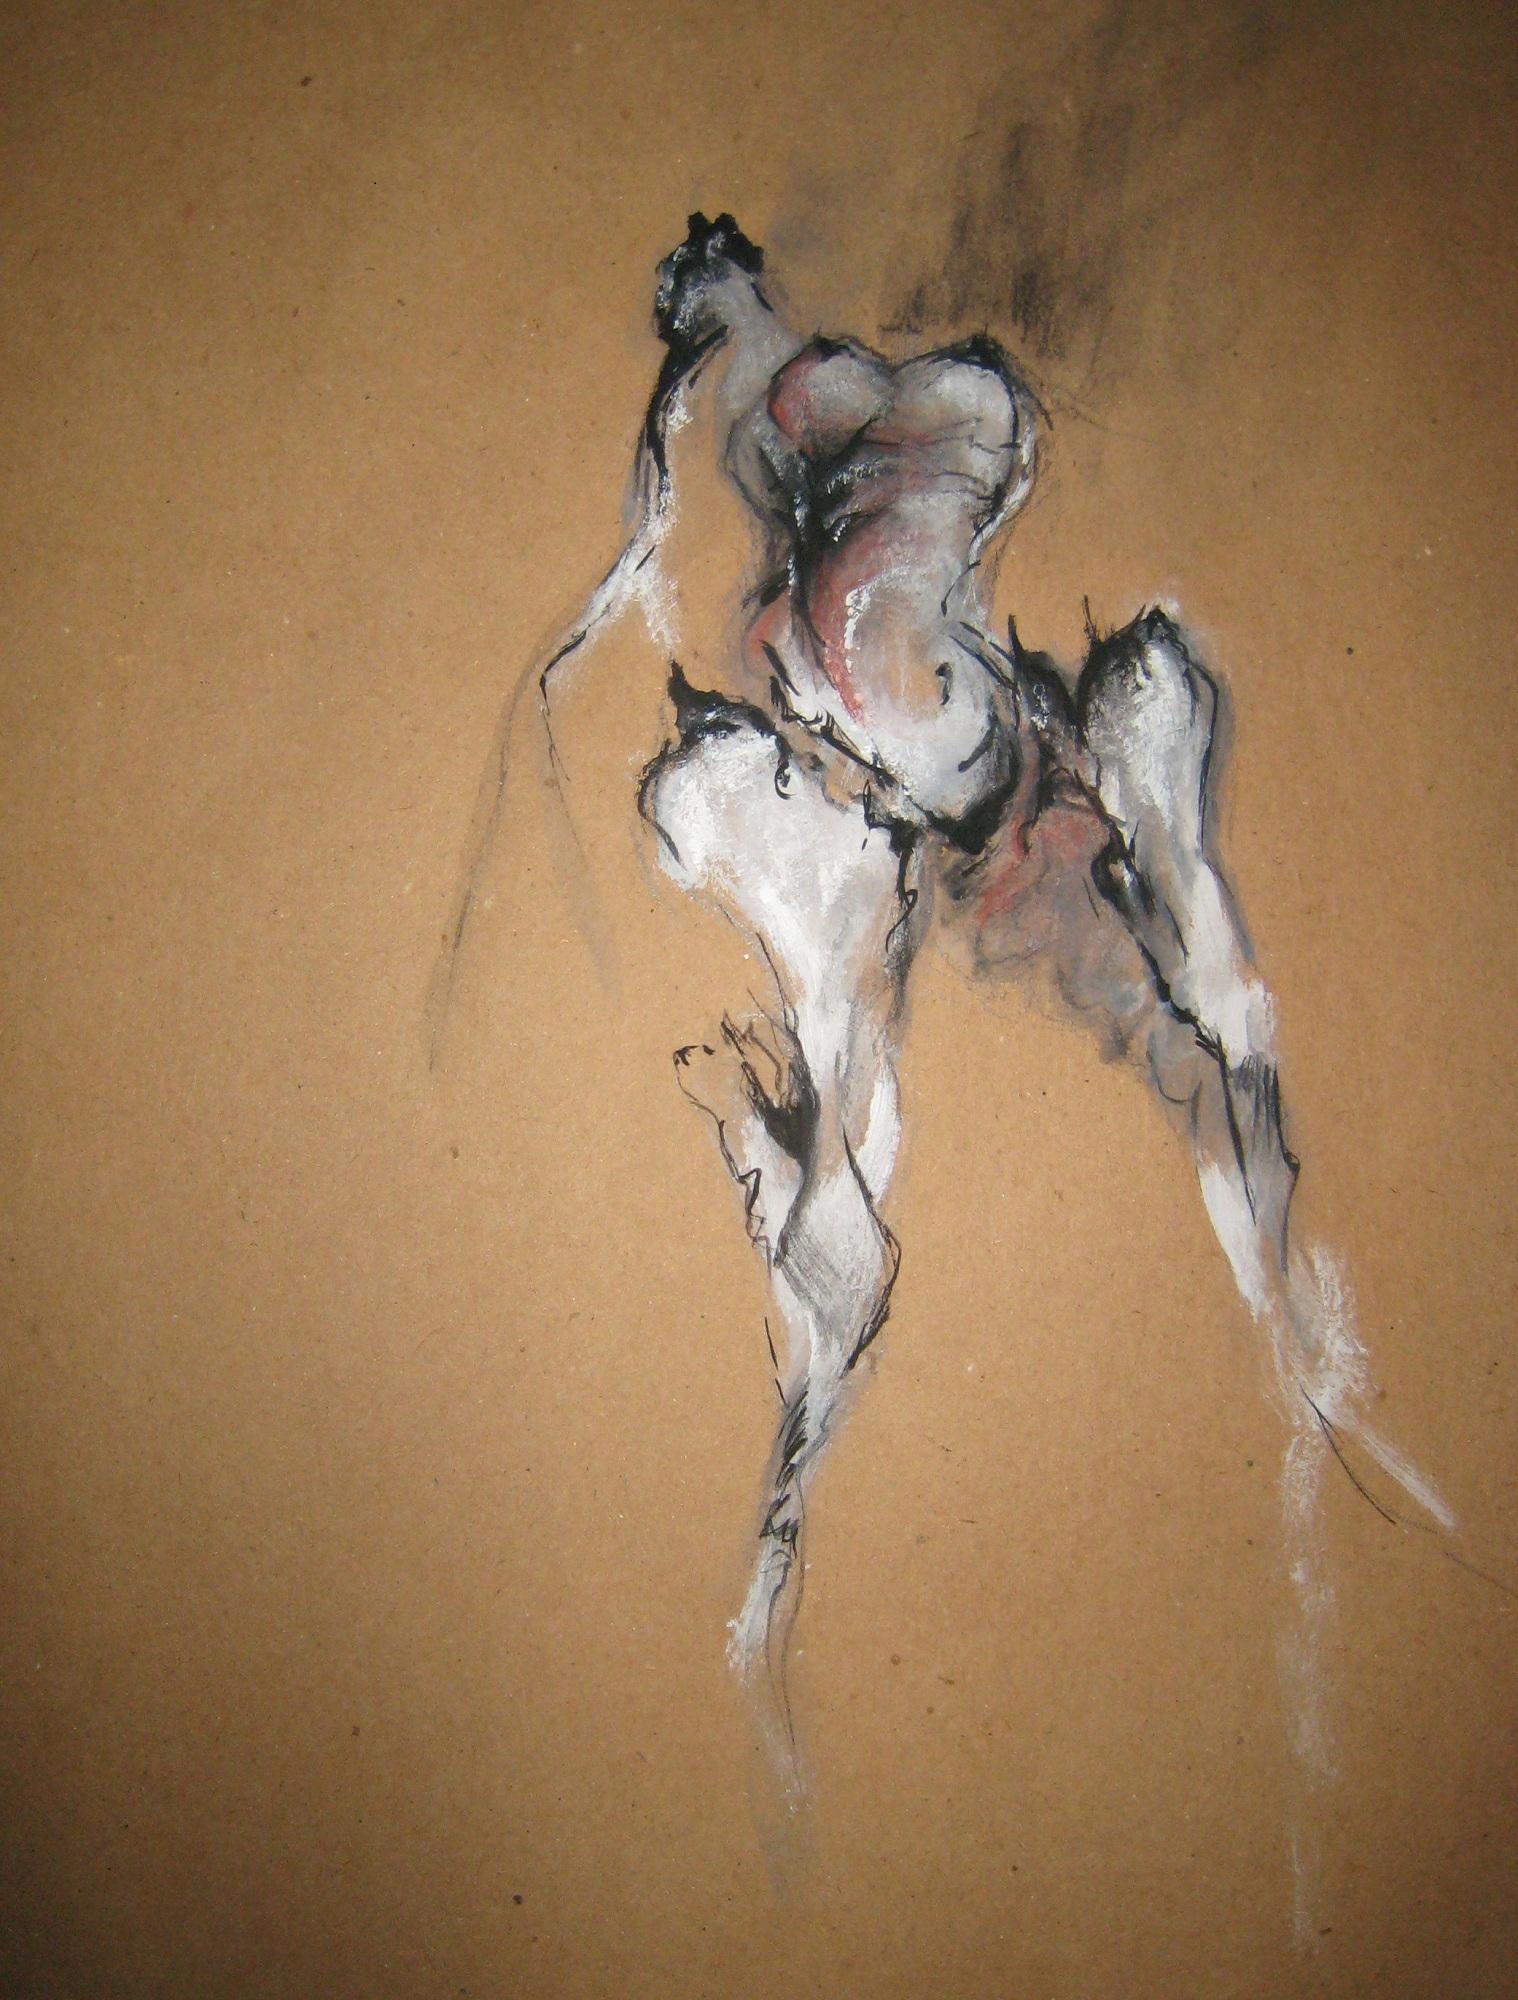 acrylic, watercolor, pencil, 2007  16 x 20 inches